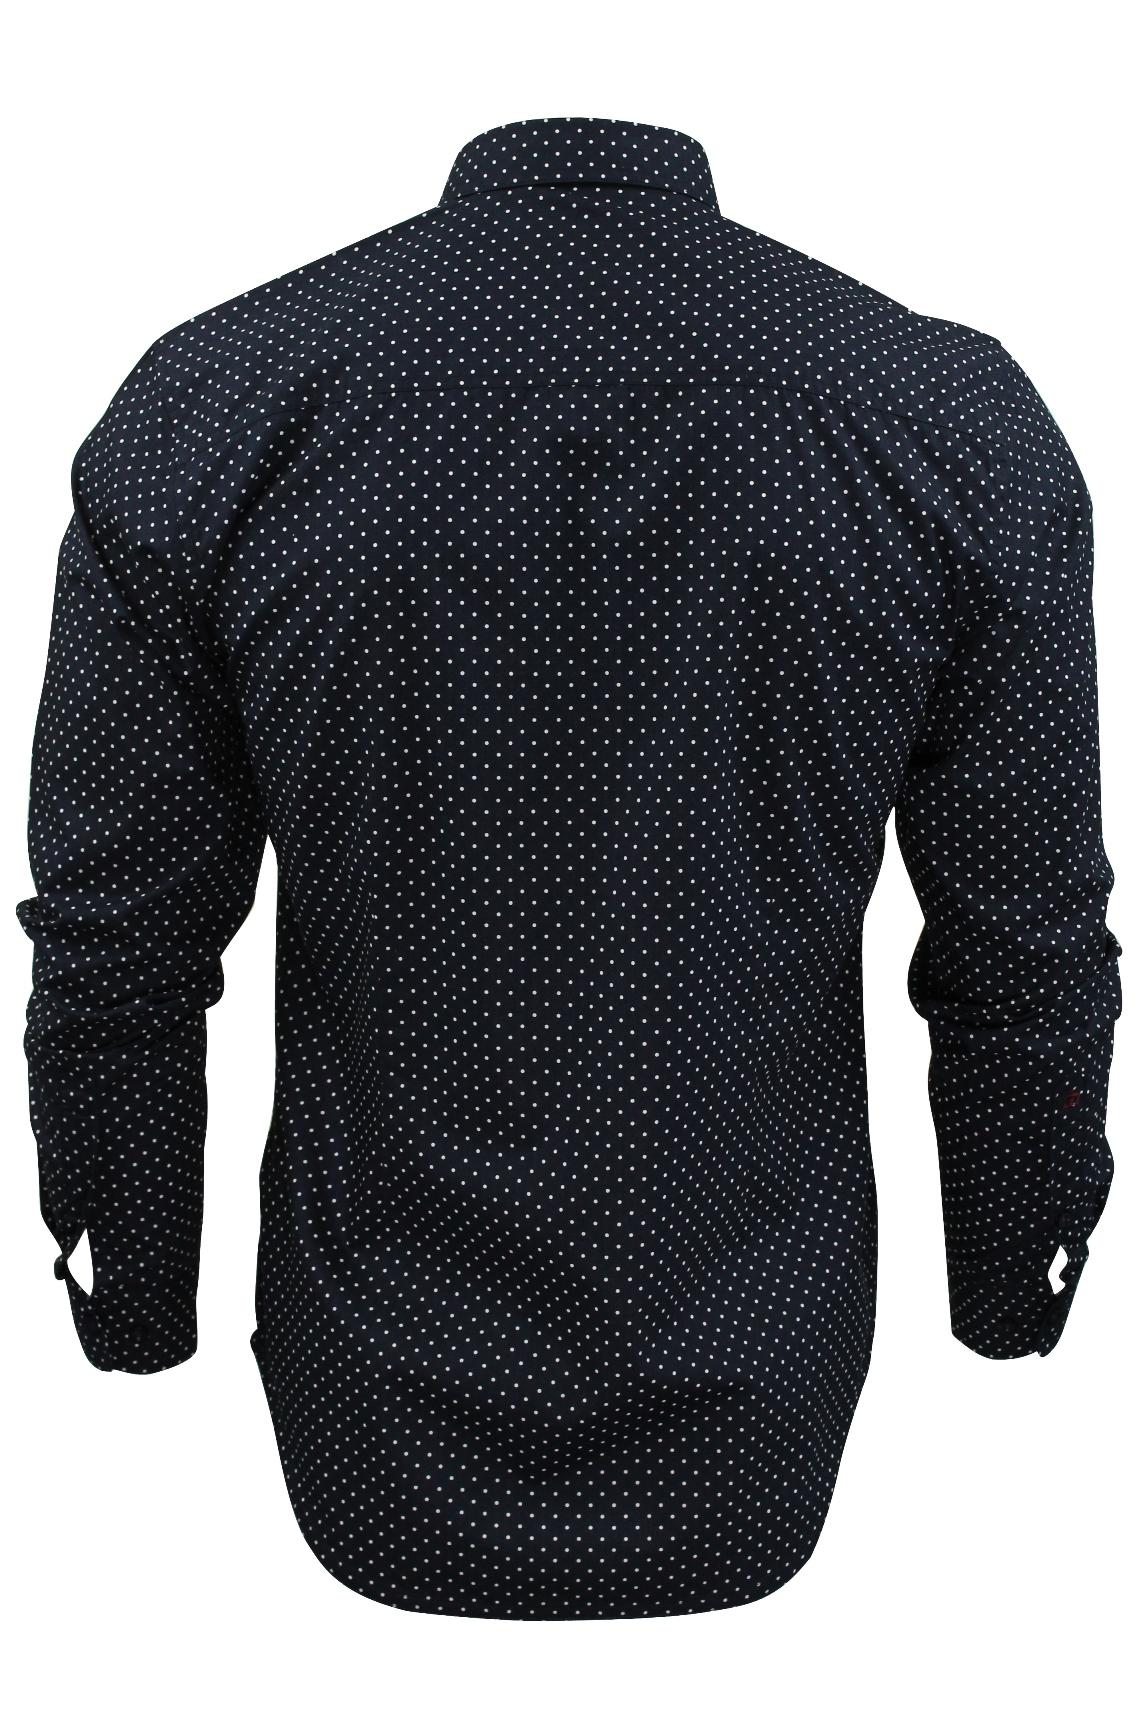 Mens-Polka-Dot-Shirt-by-Merc-London-039-Siegel-039-Long-Sleeved thumbnail 5